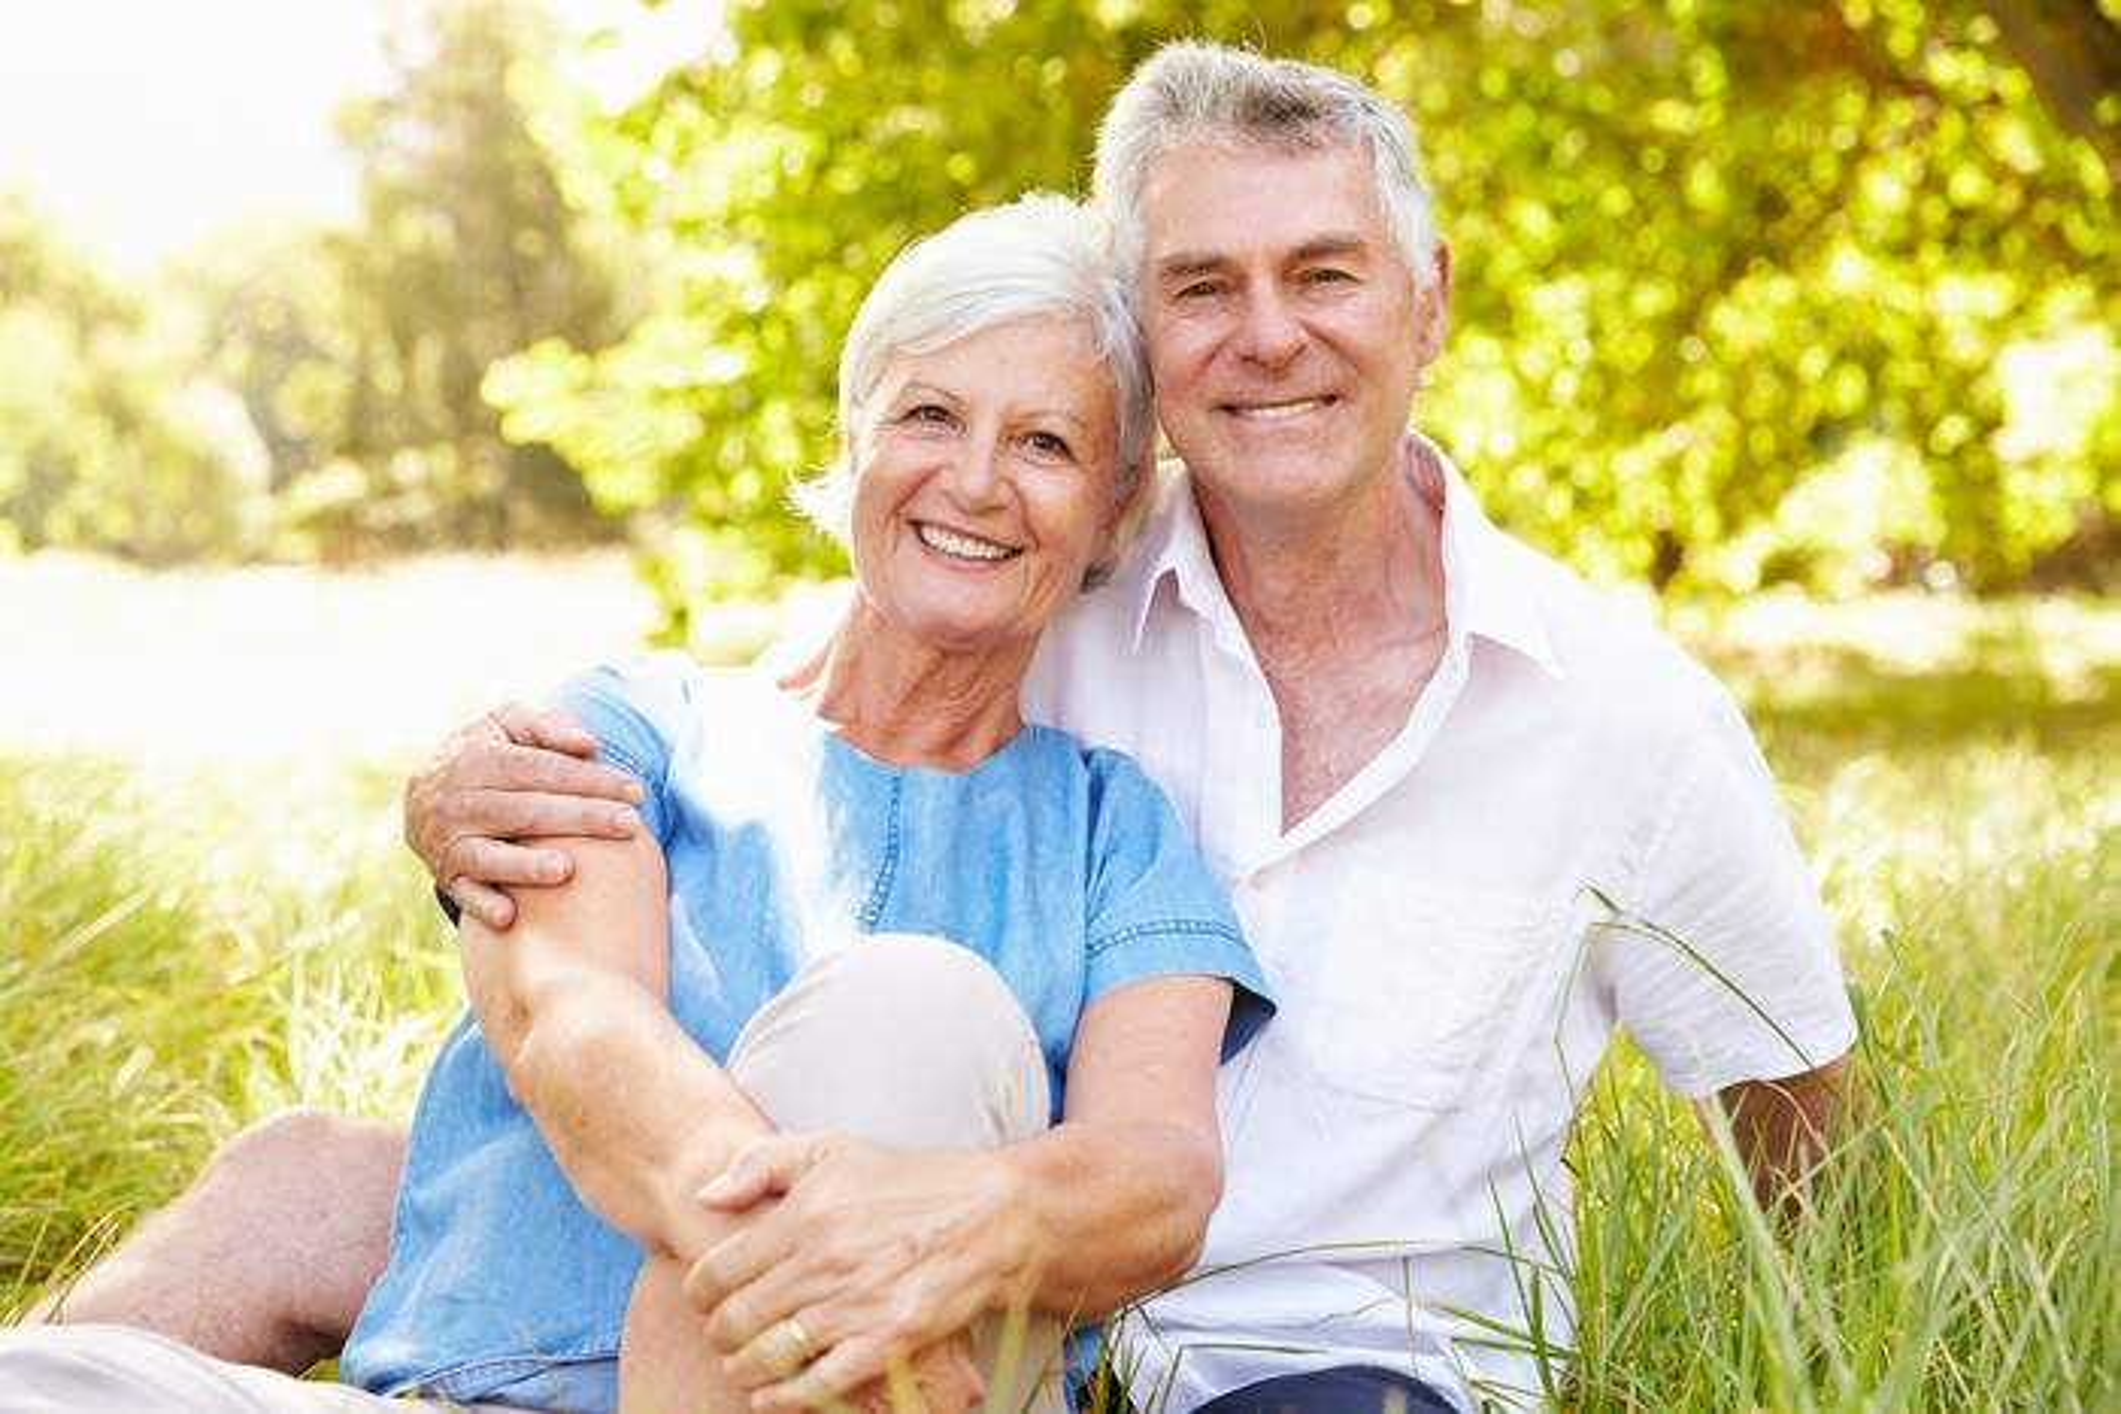 Senior couple at the park